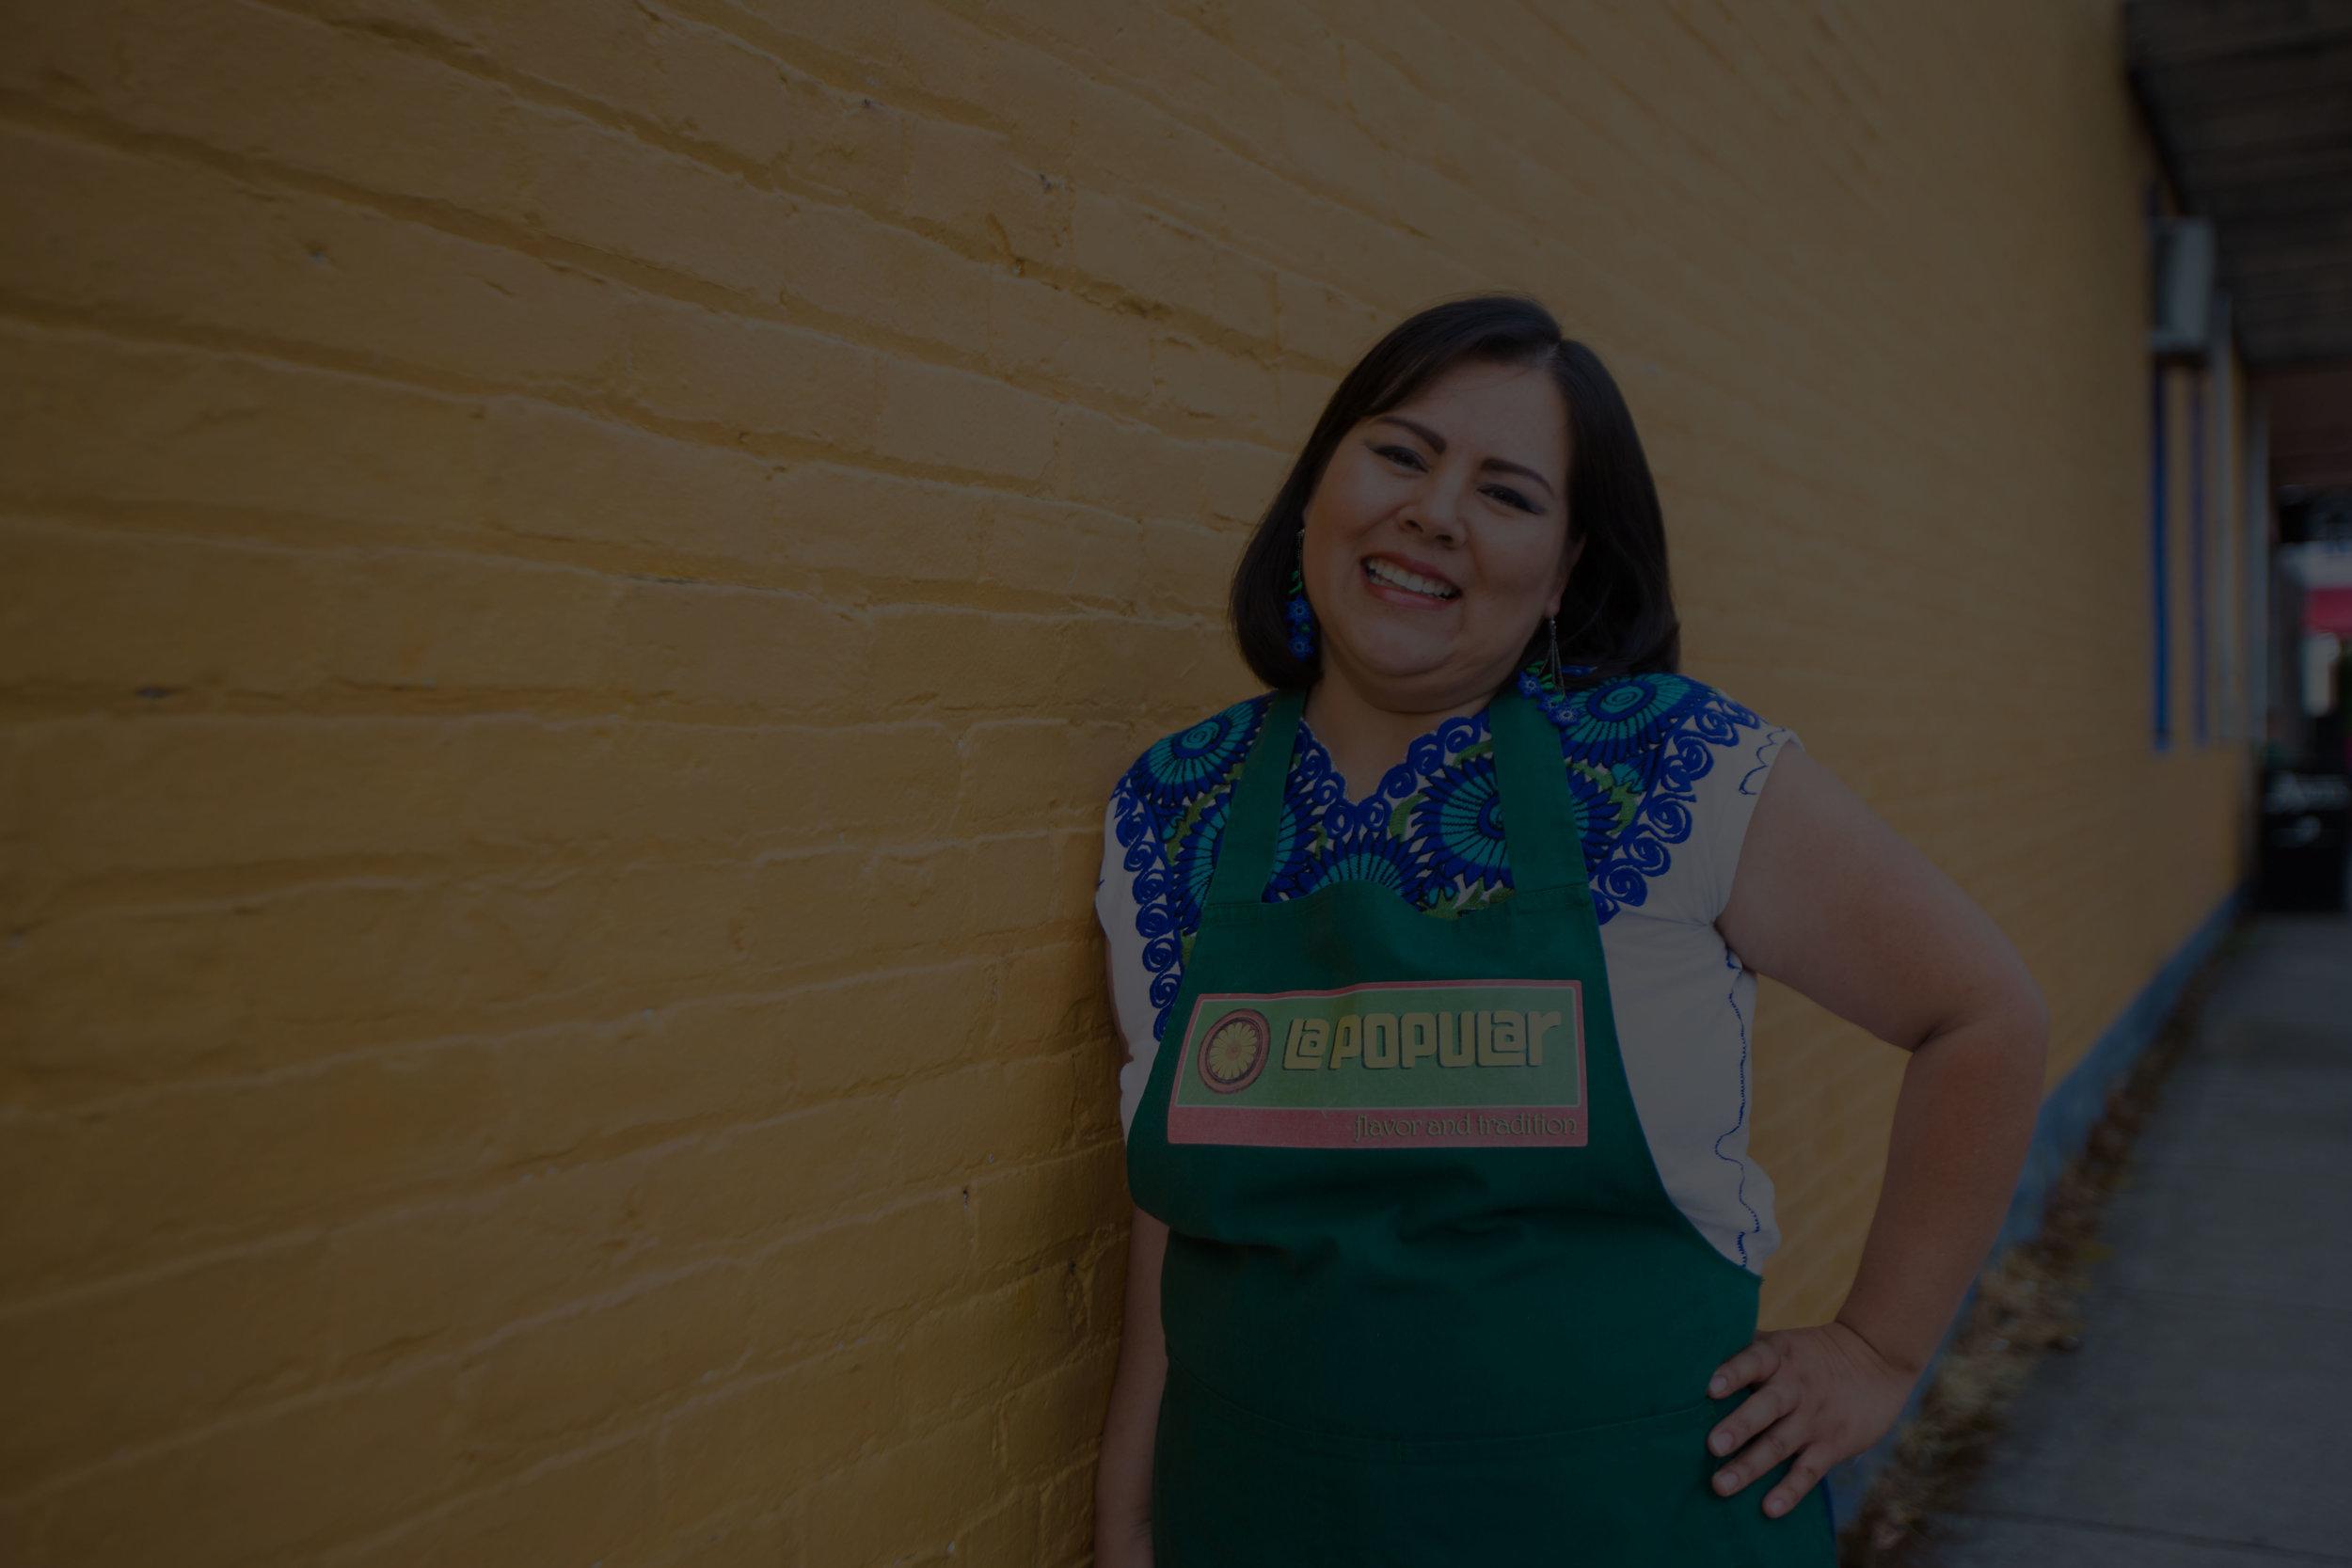 Empresas helped her start her own Business. -